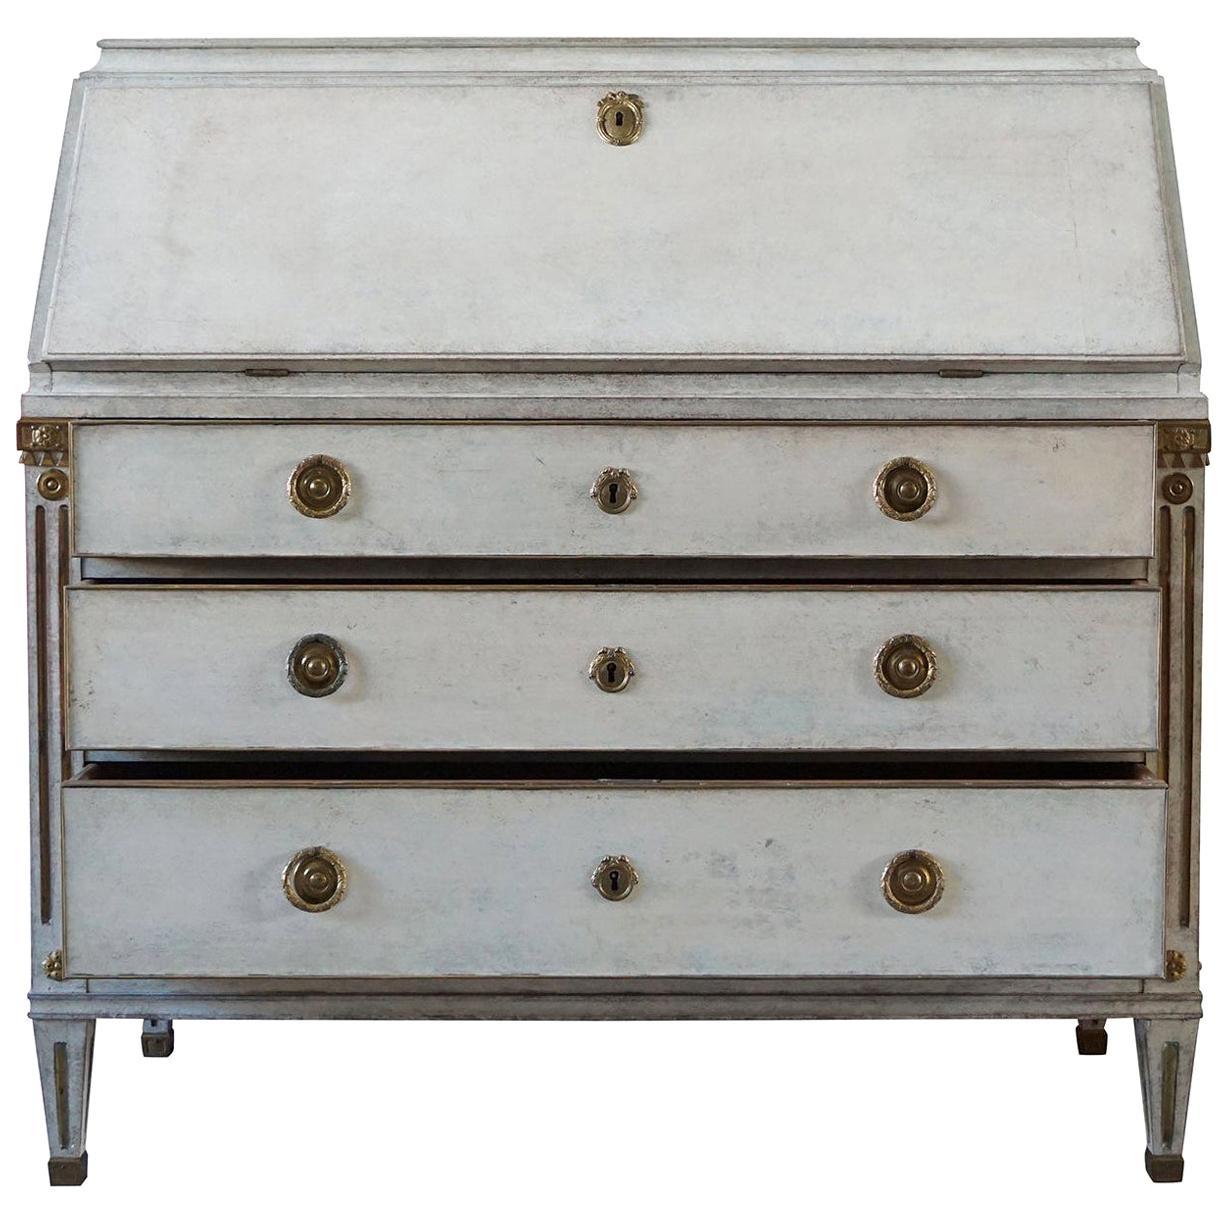 19th Century Grey Swedish Gustavian Bureau or Writing Desk, Pinewood Secretaire